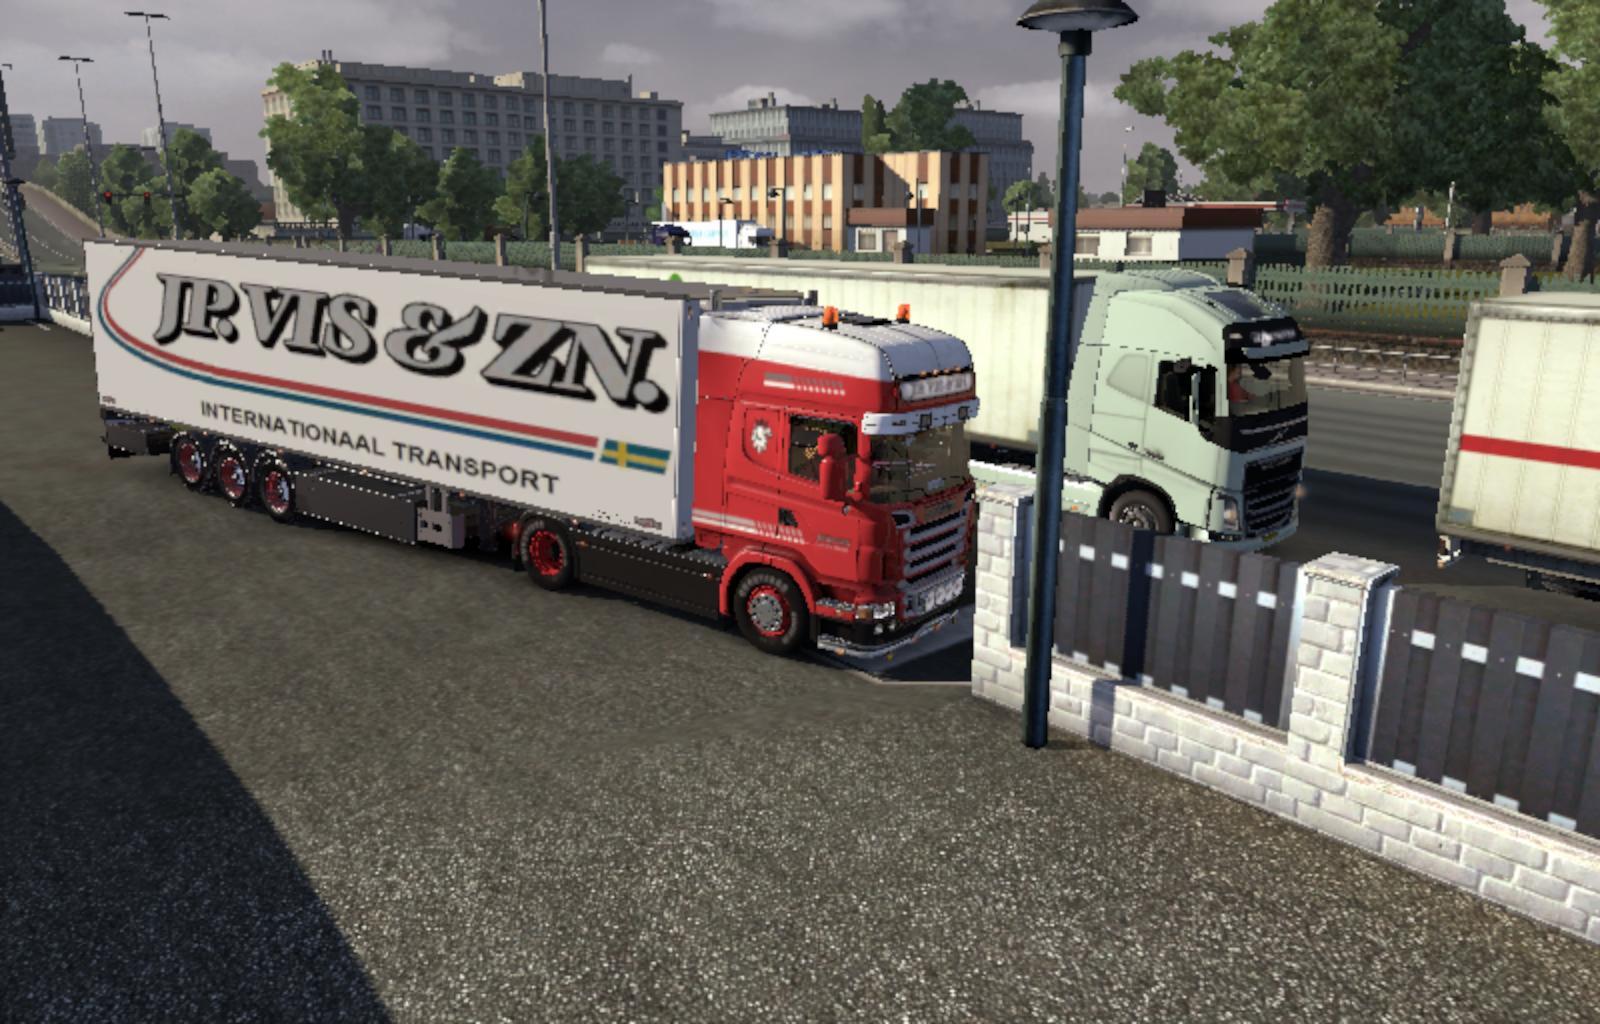 JP. Vis - Scania R2008 & Trailer 1.13.3 - Modhub.us